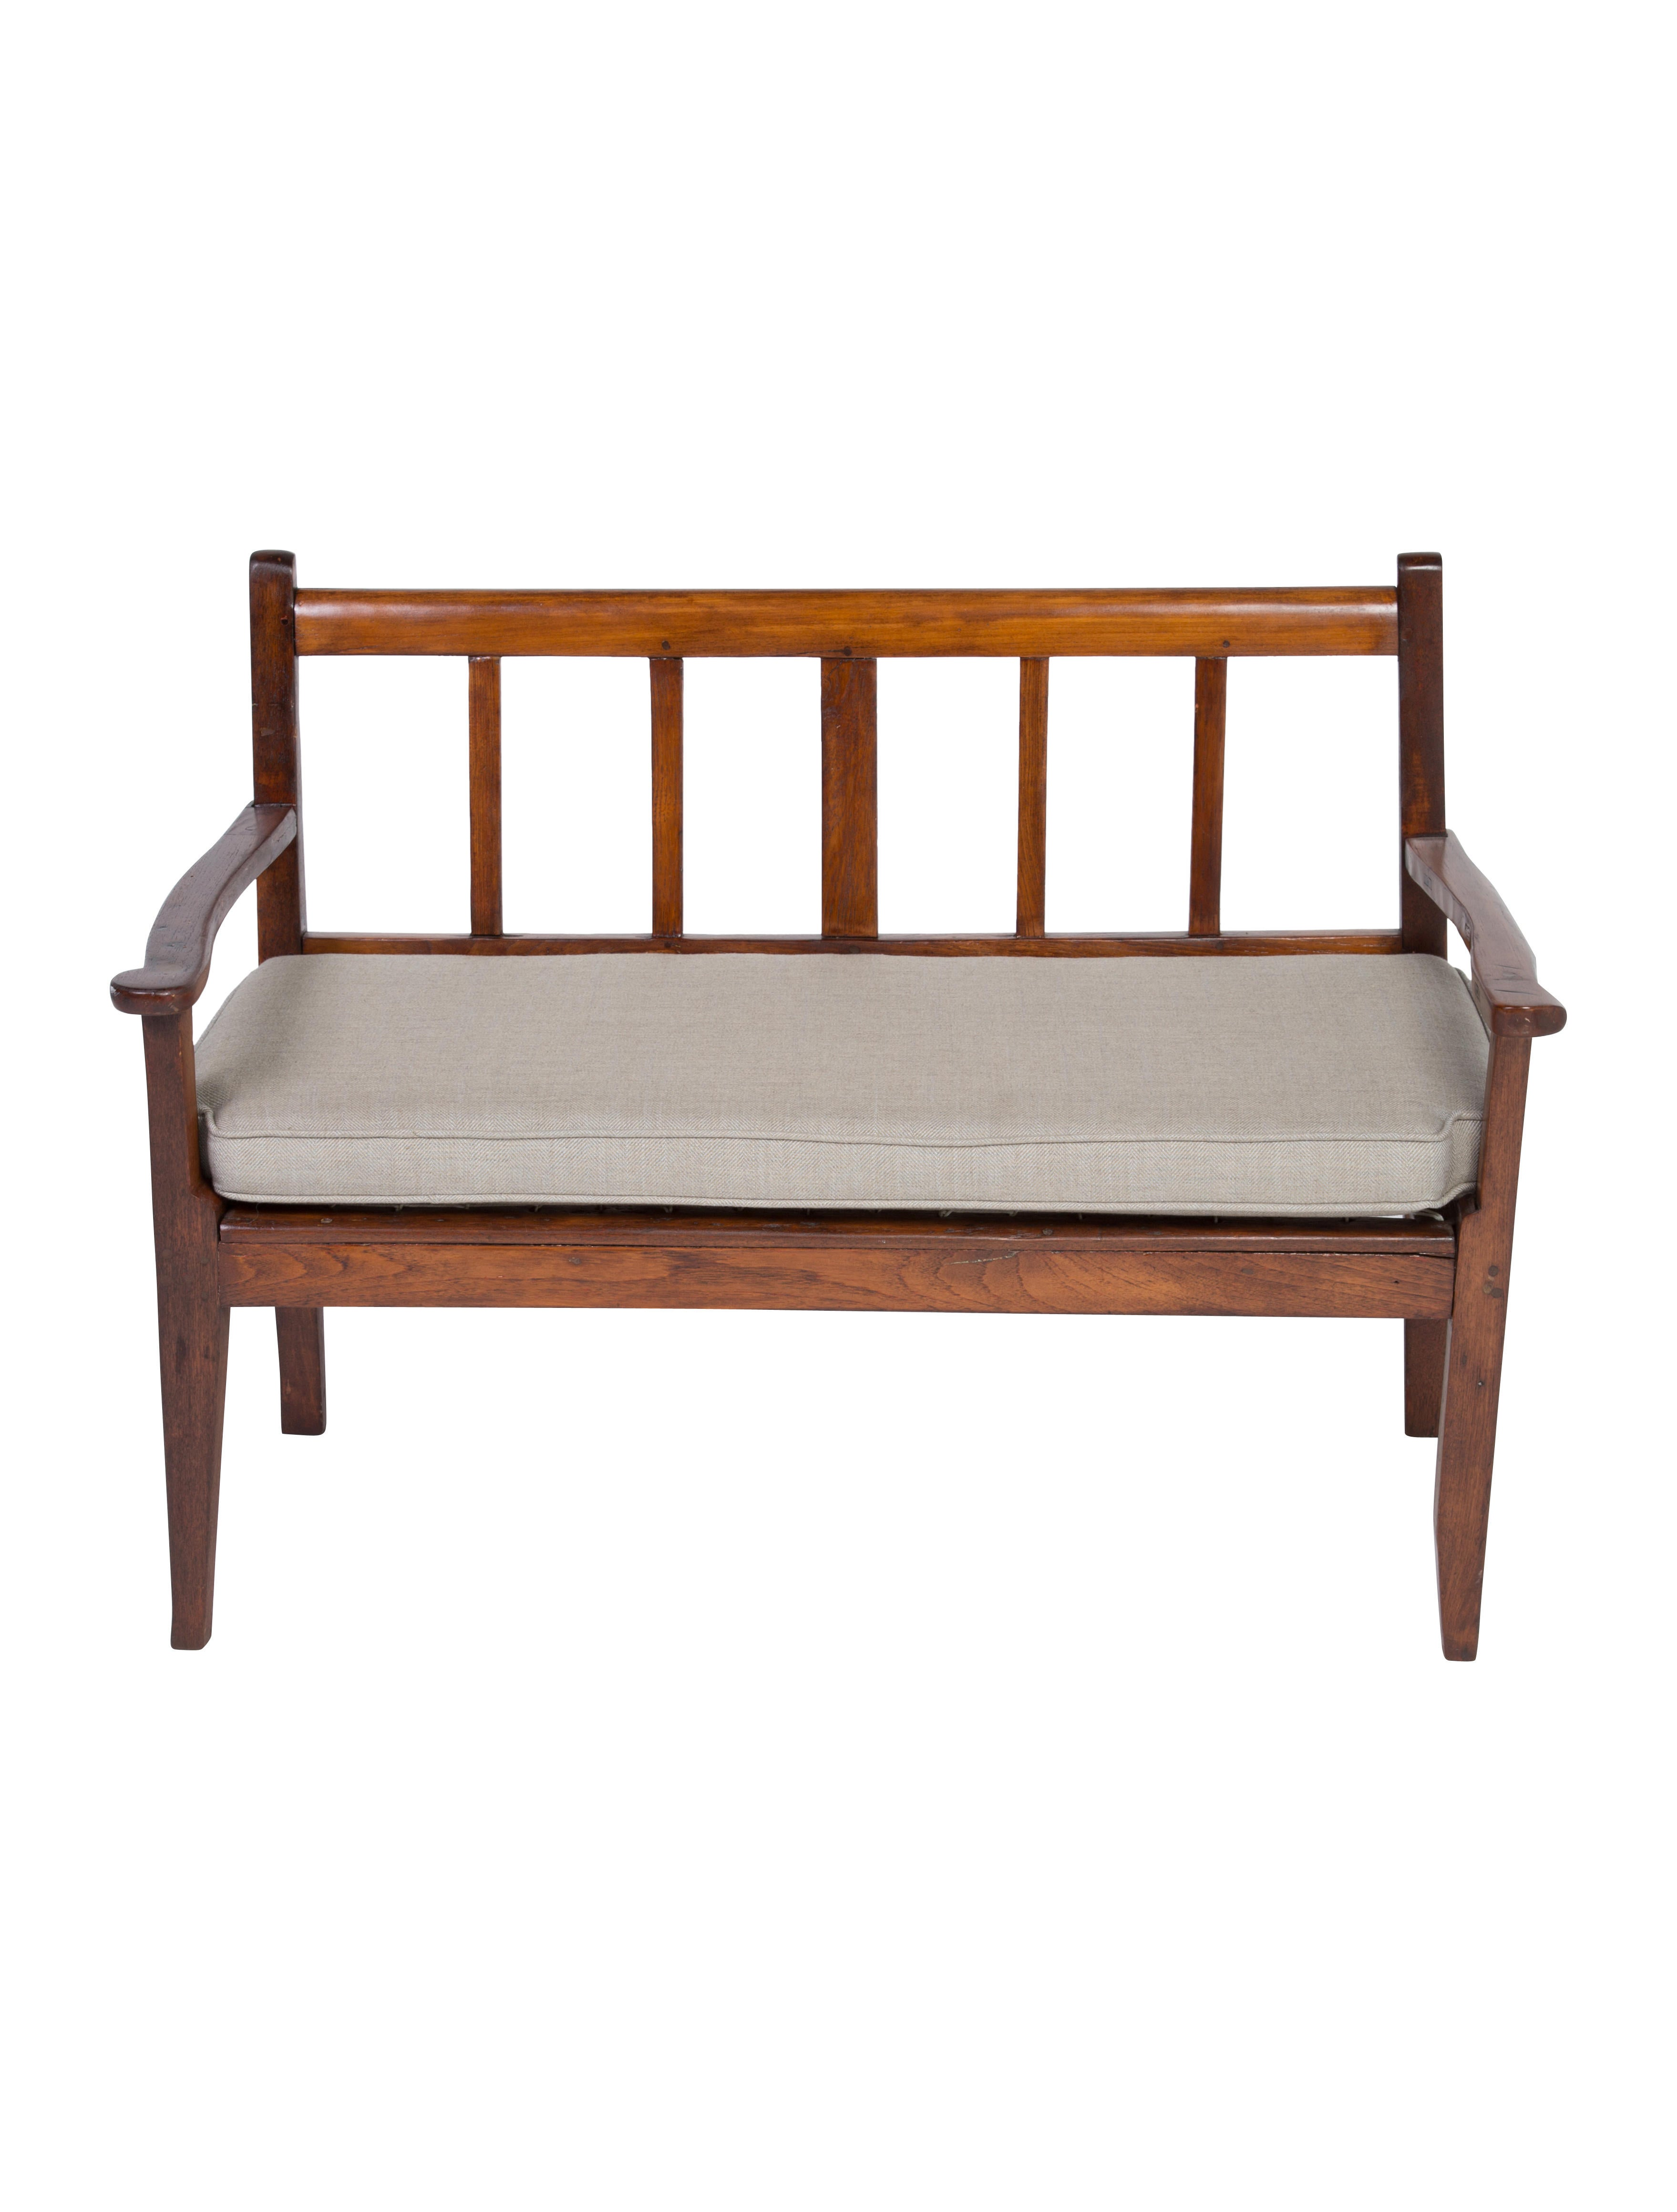 19th Century Walnut Bench Furniture Furni20735 The